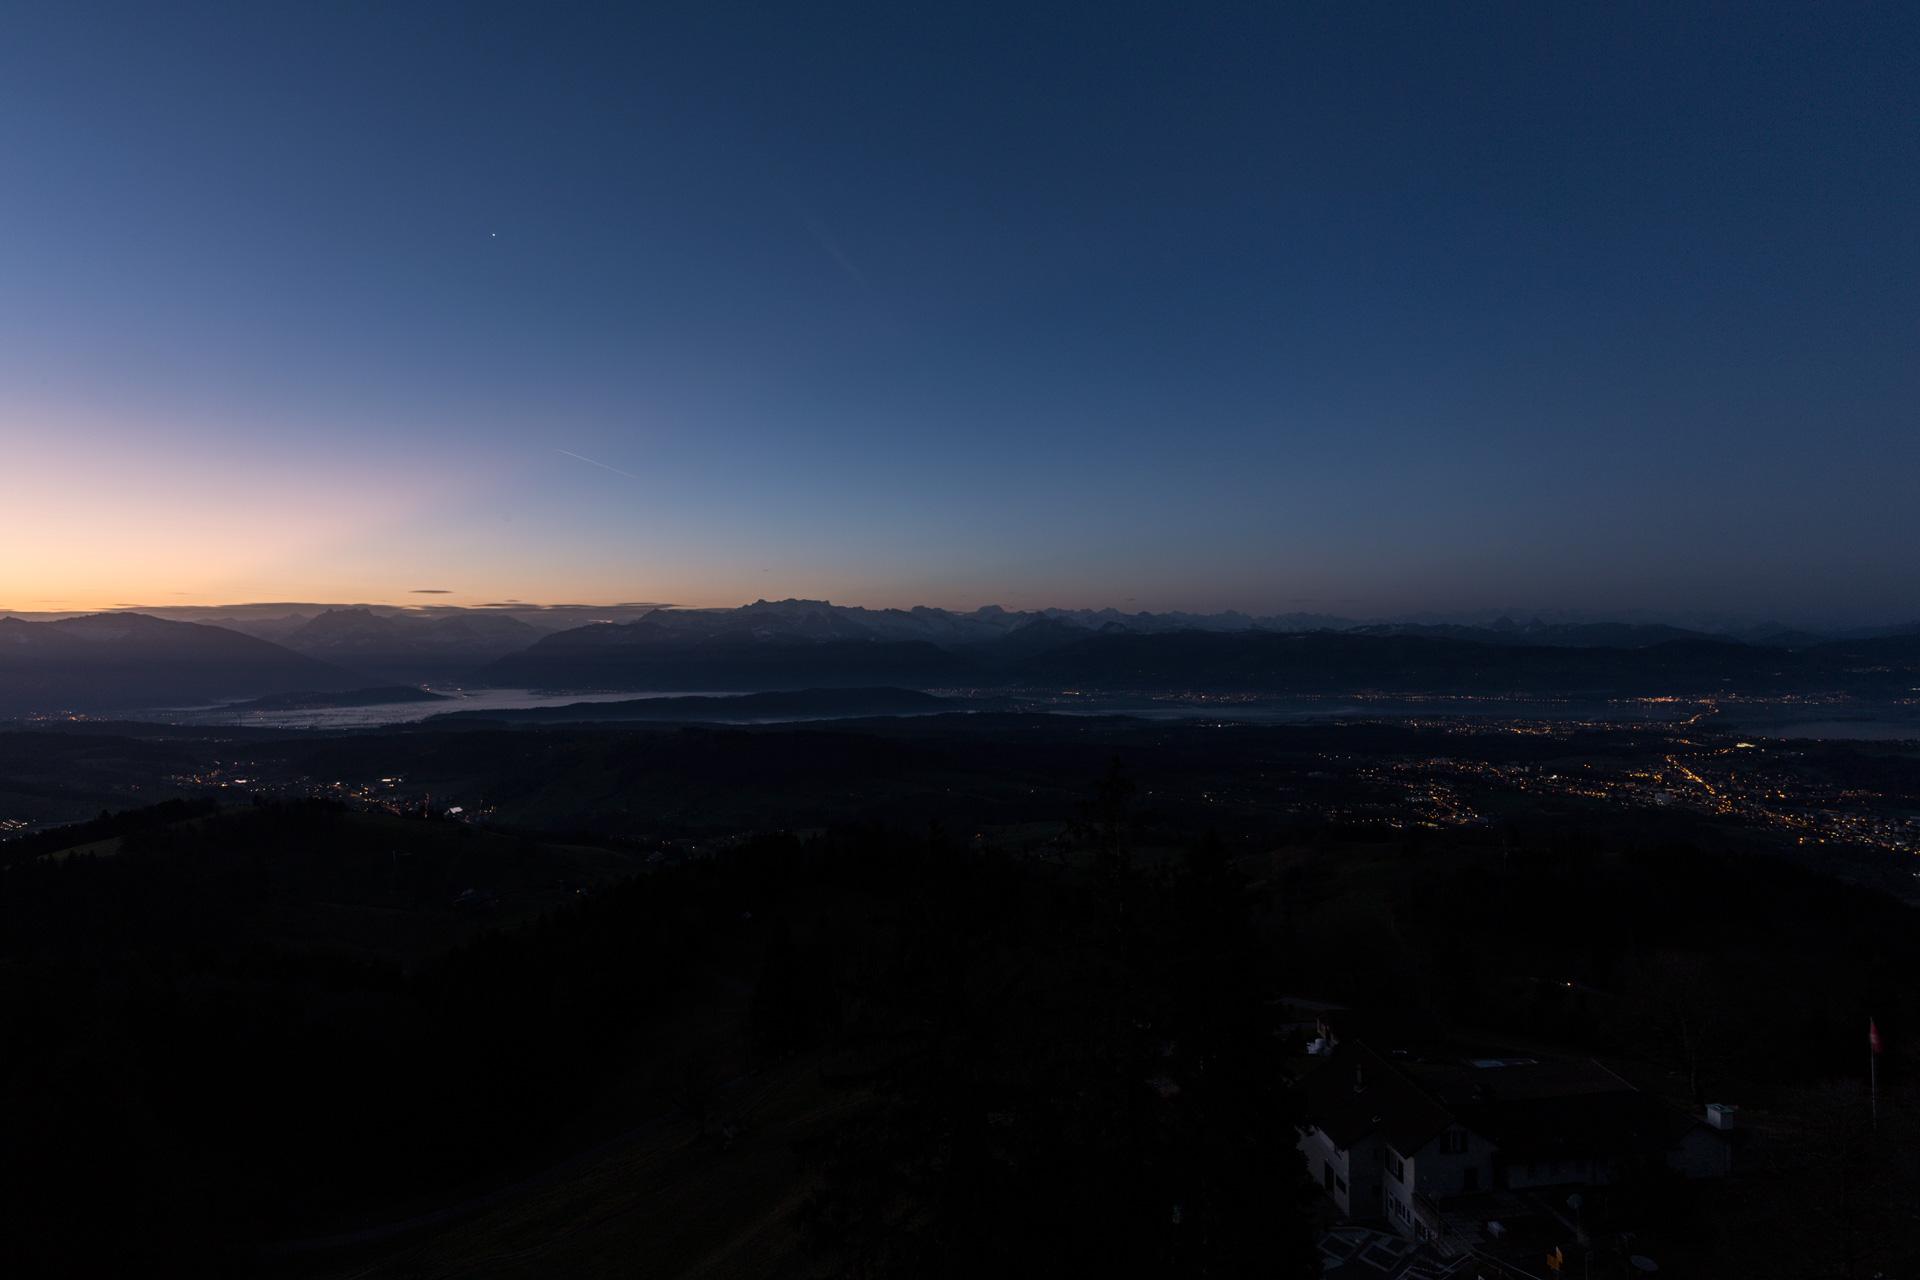 Sonnenaufgang-Bachtelturm_20151219_5844-1